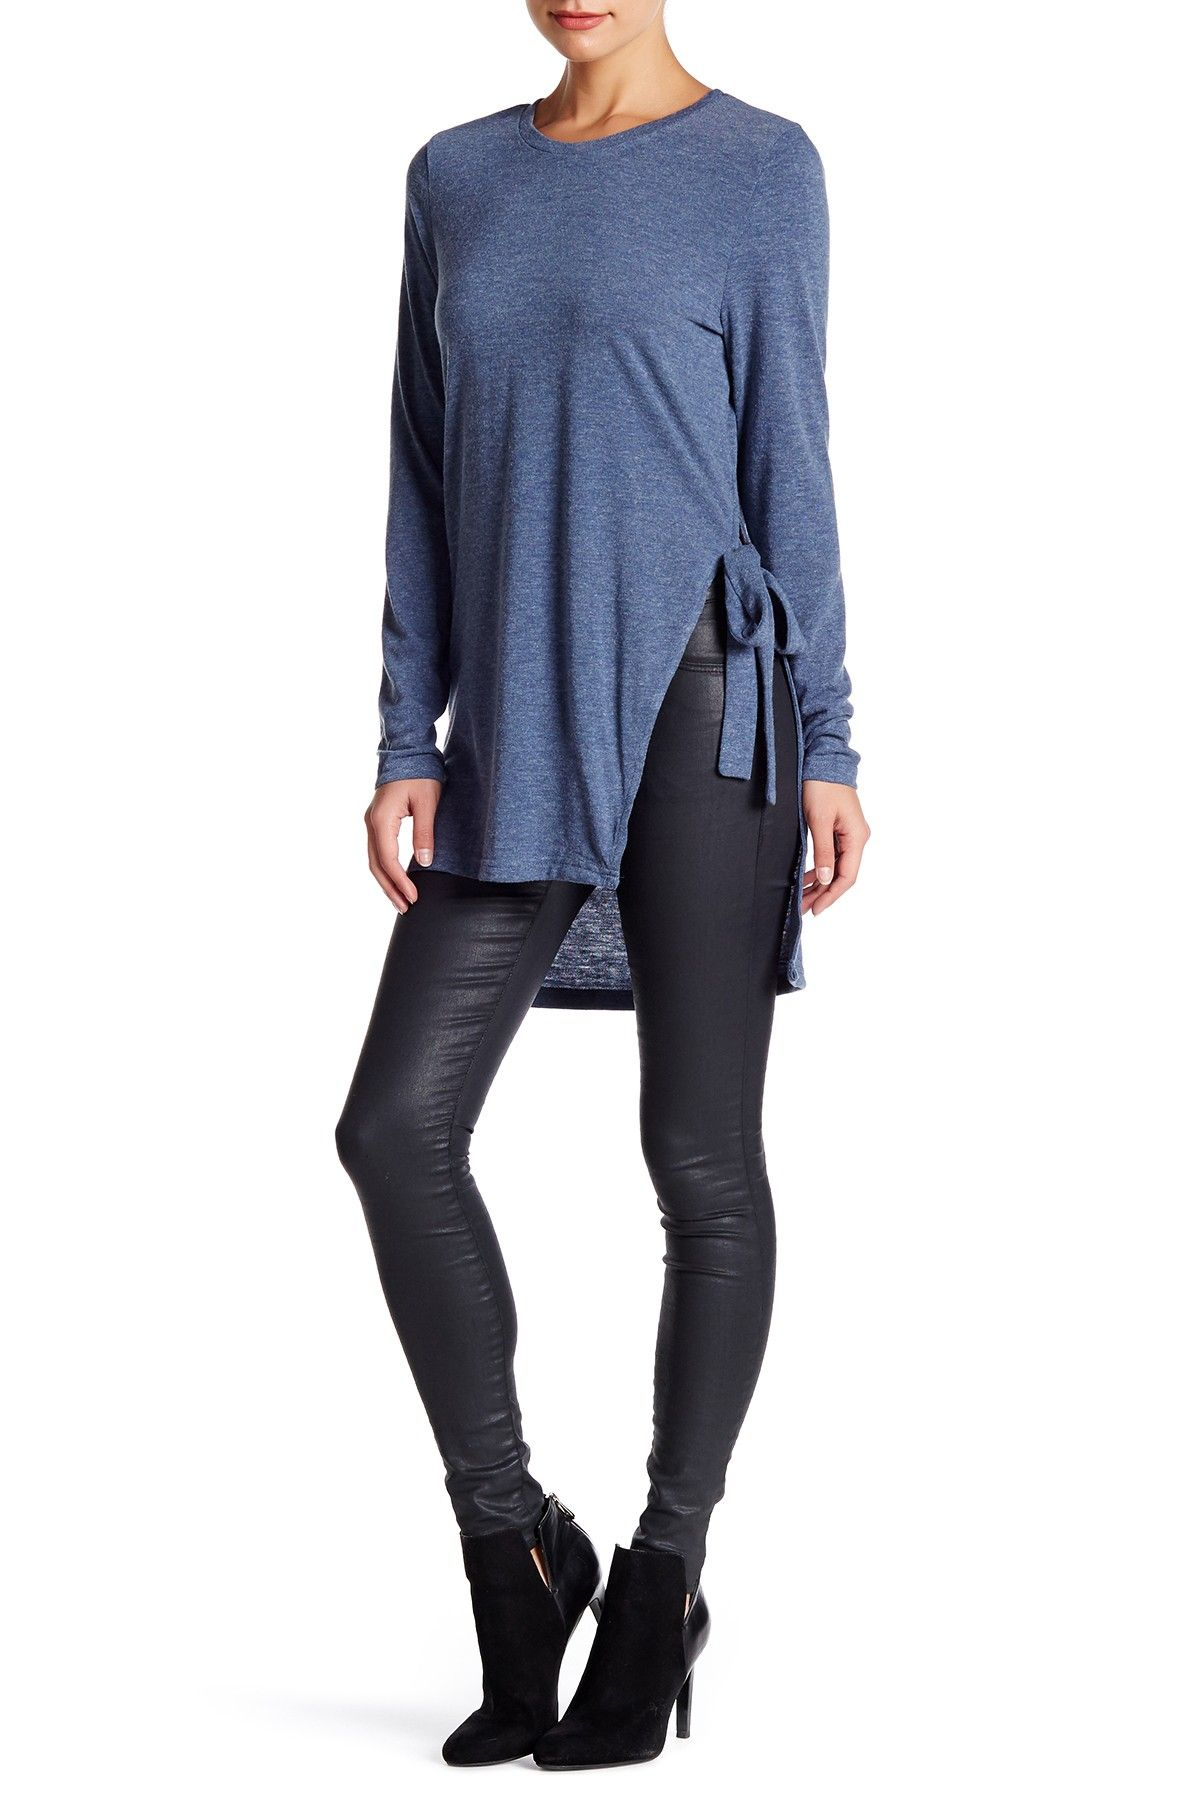 Heathered Knit Split Seam Self-Tie Tunic